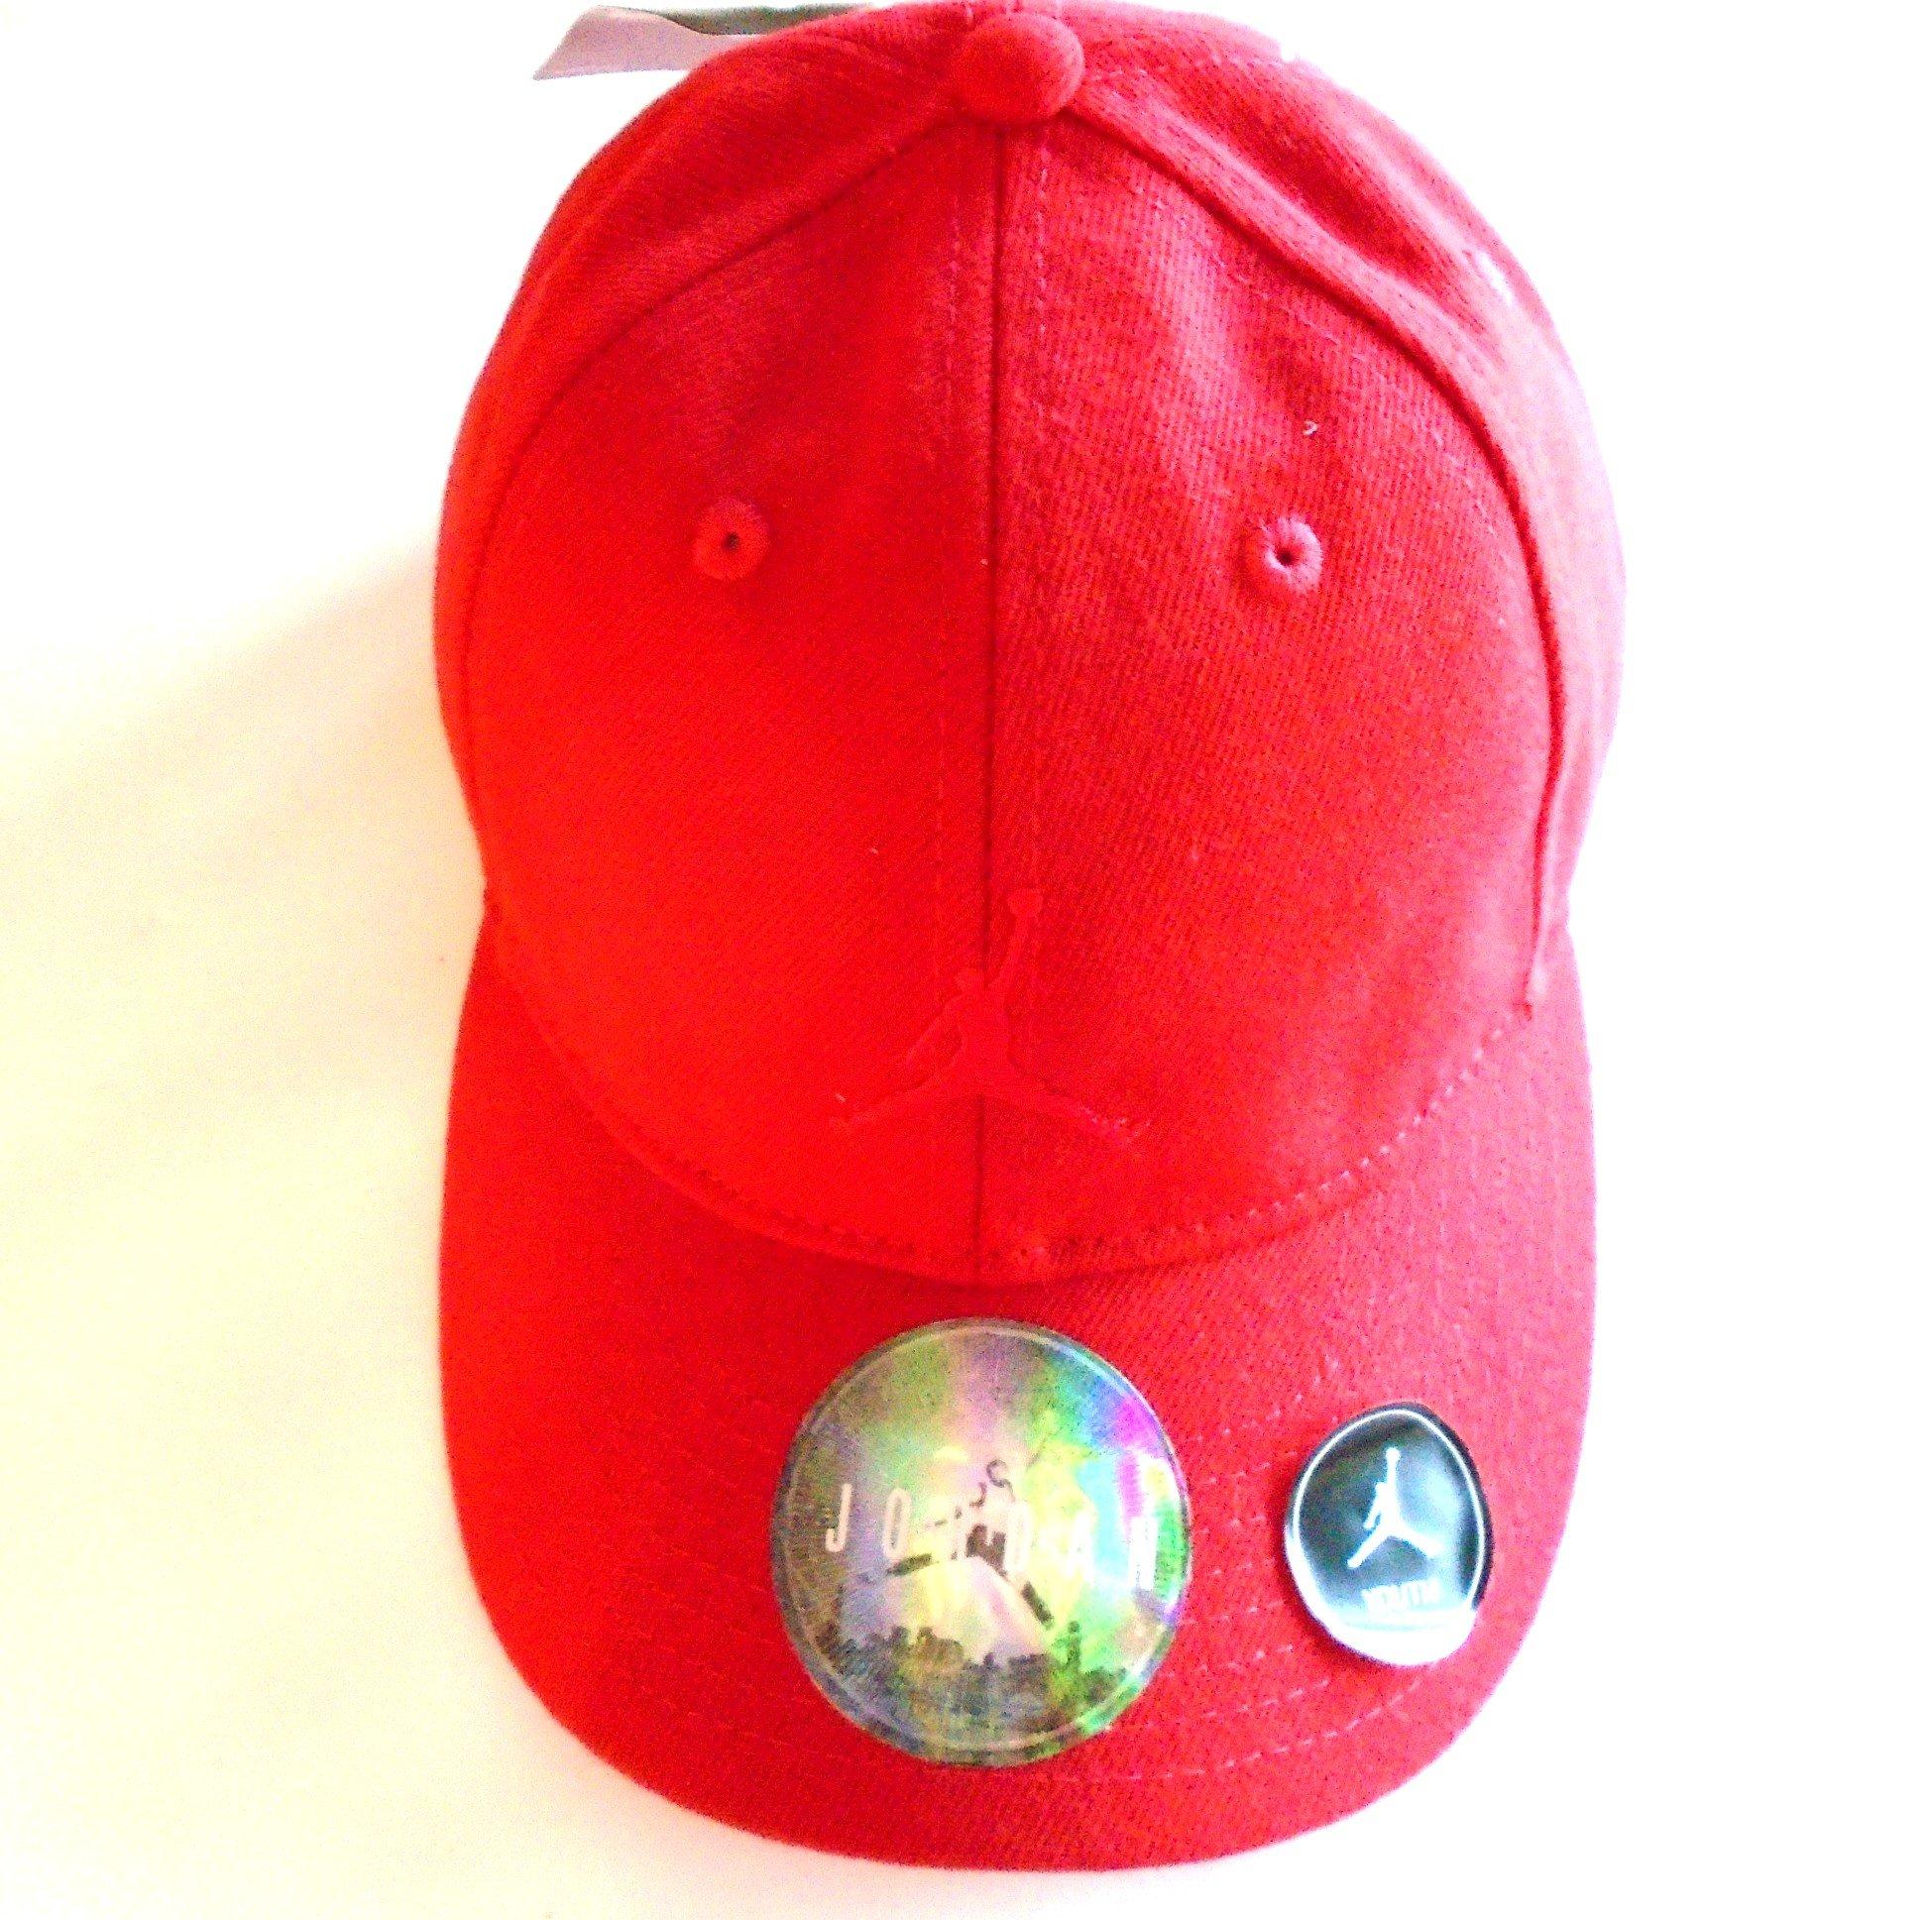 NIKE Michael Jordan Air Jumpman Hat Adjustable Back Court Cap (Classic Bull's Red) Youth 8-20